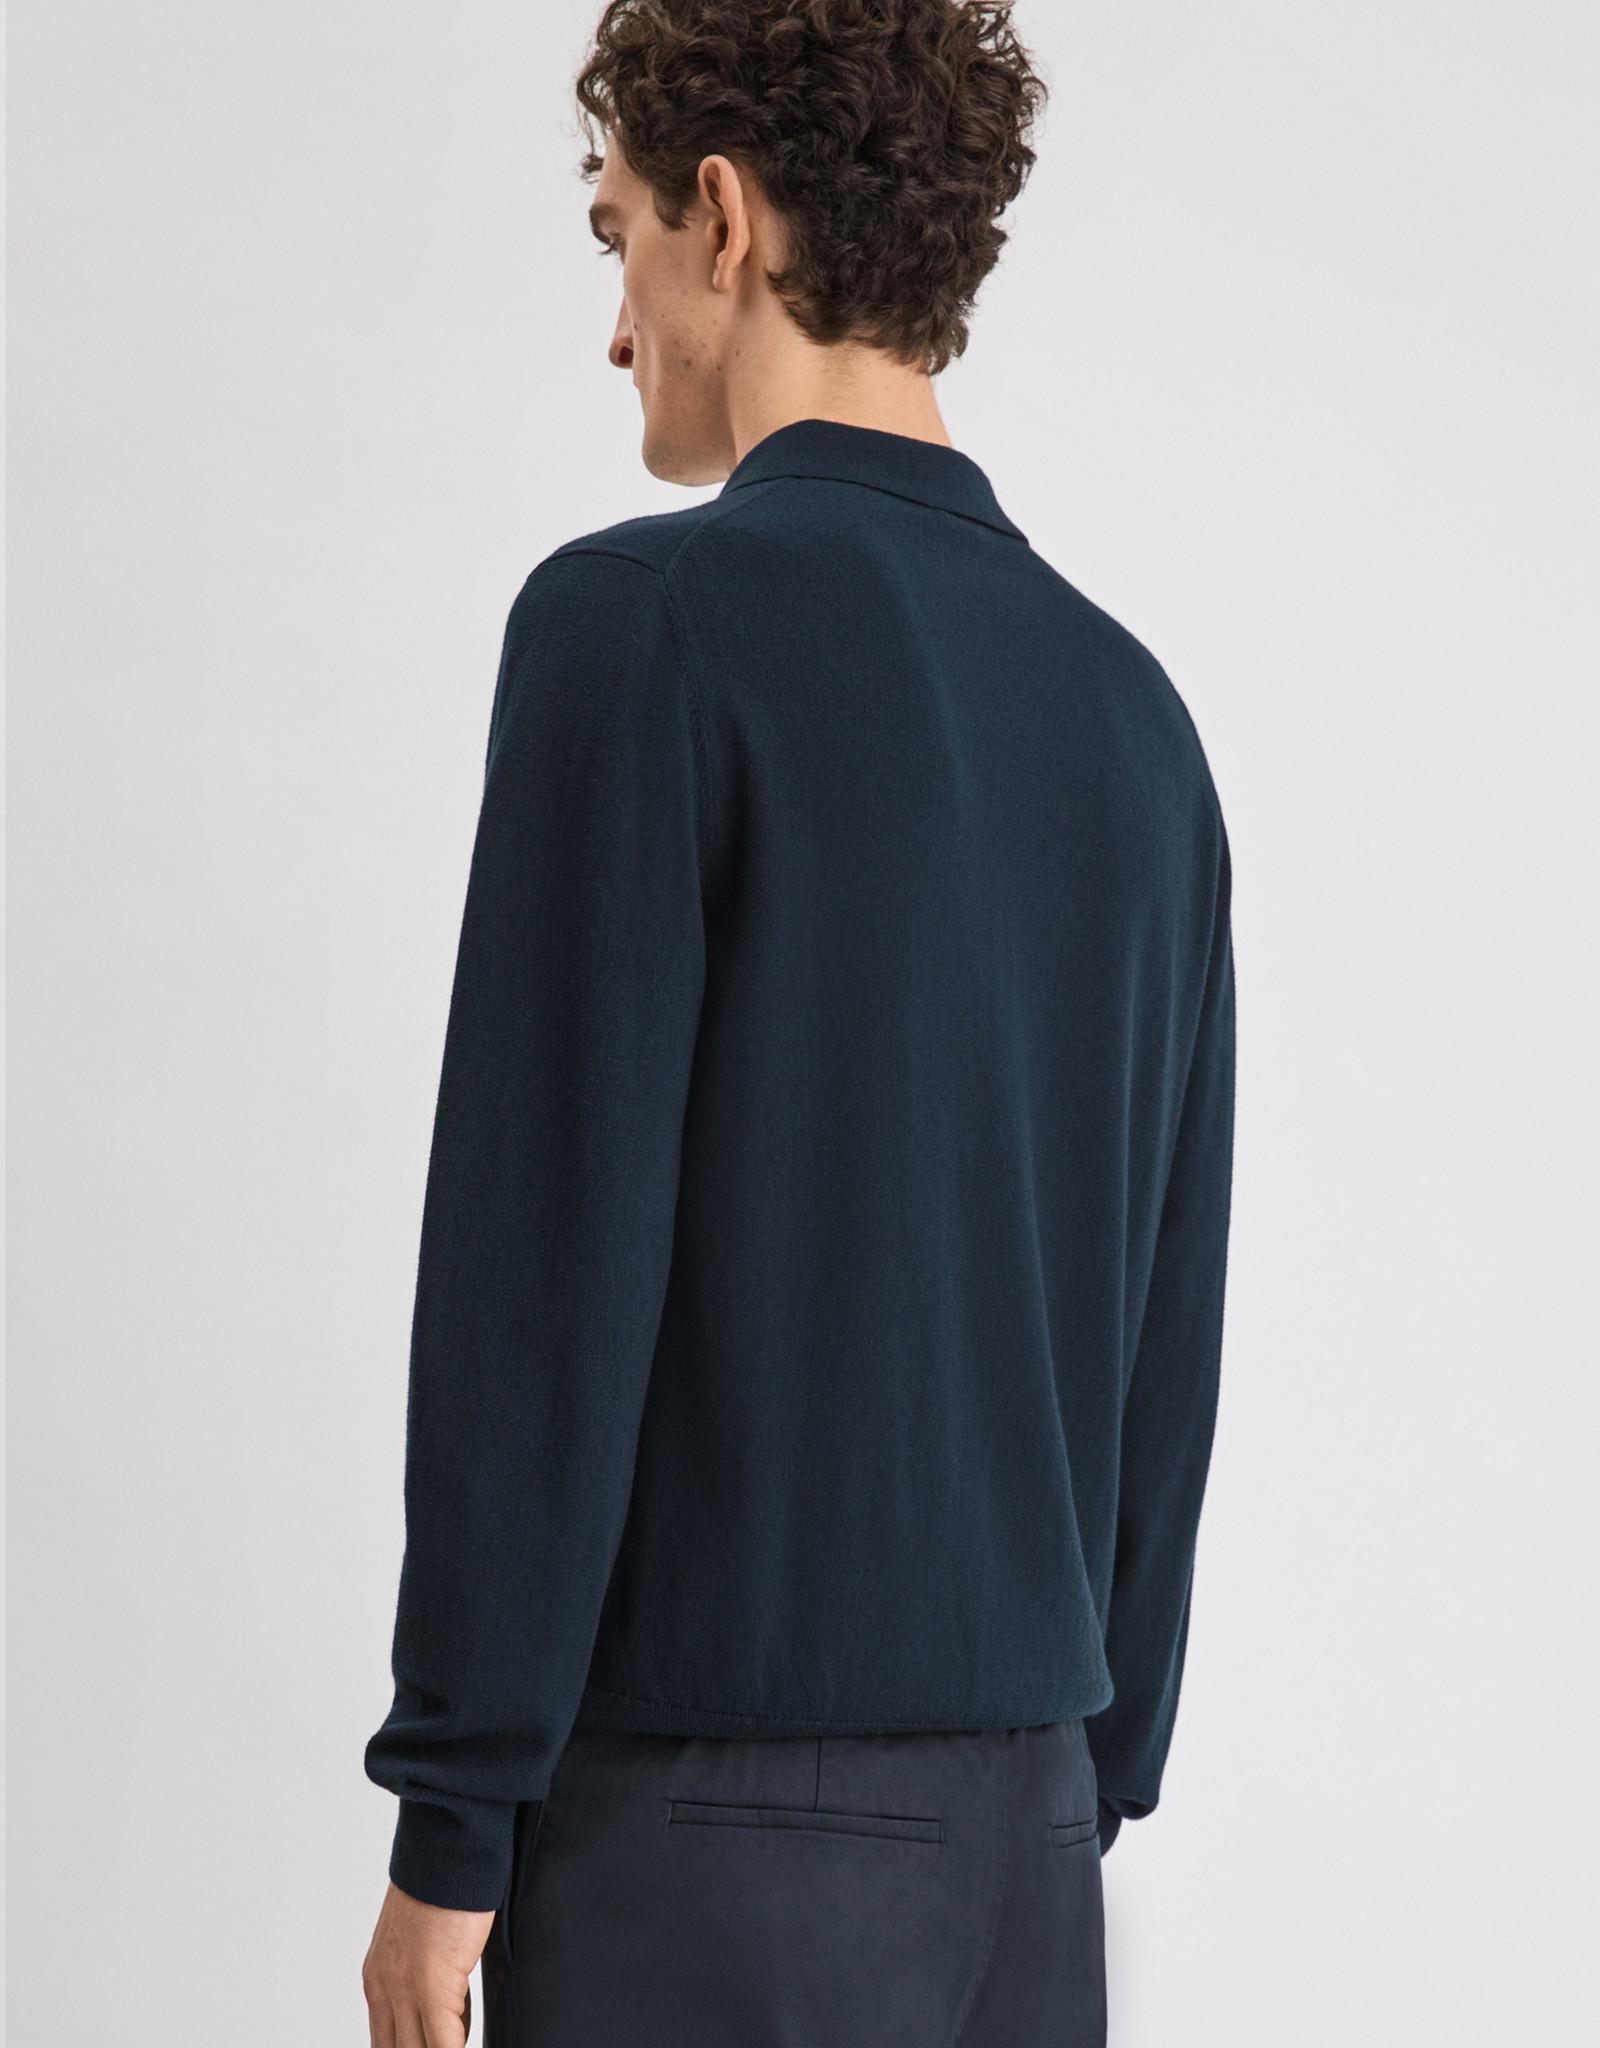 Filippa K M. Knitted Polo Shirt Navy